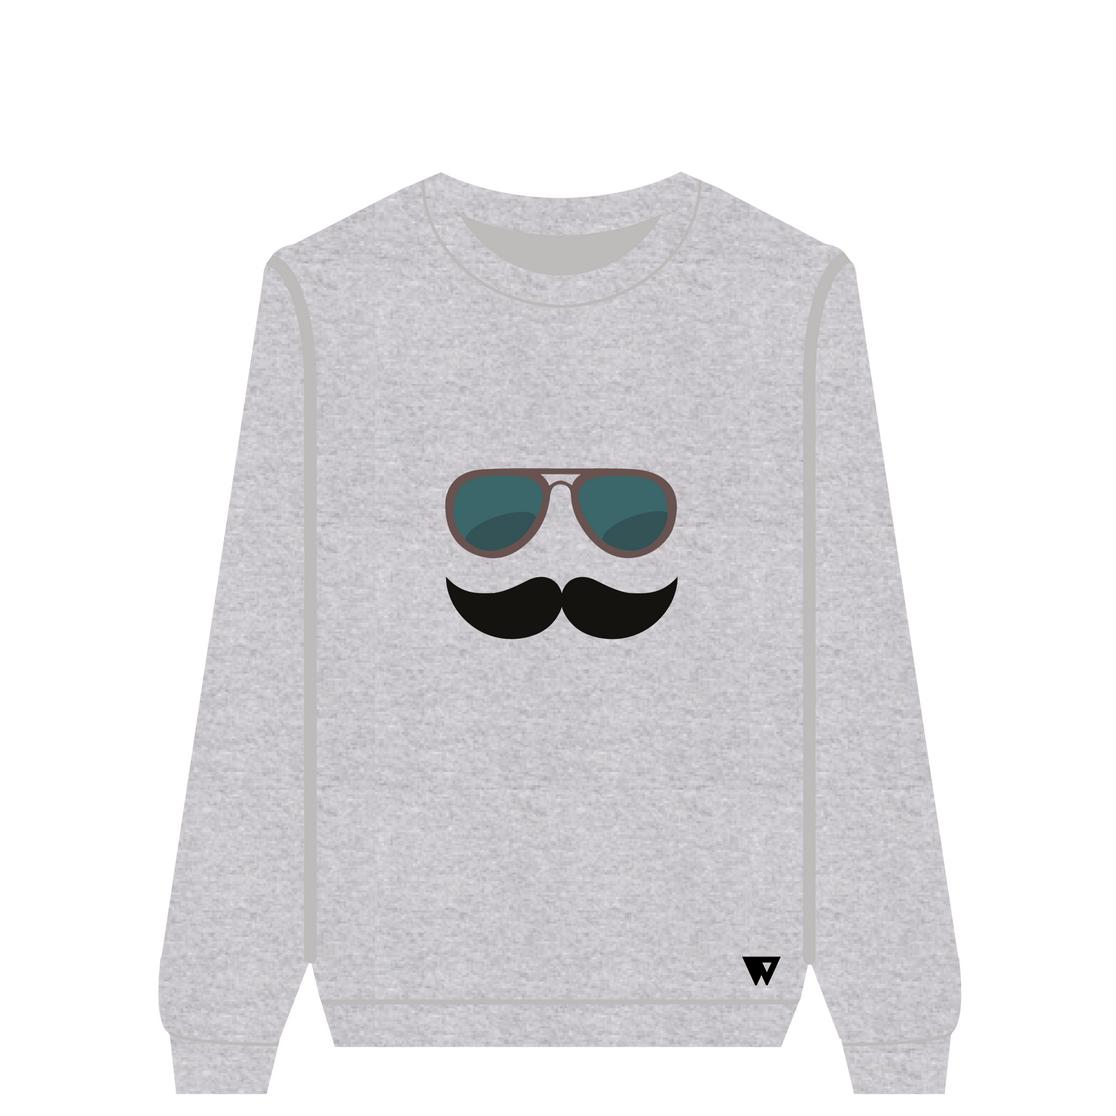 Sweatshirt Mustache Glasses | Wuzzee